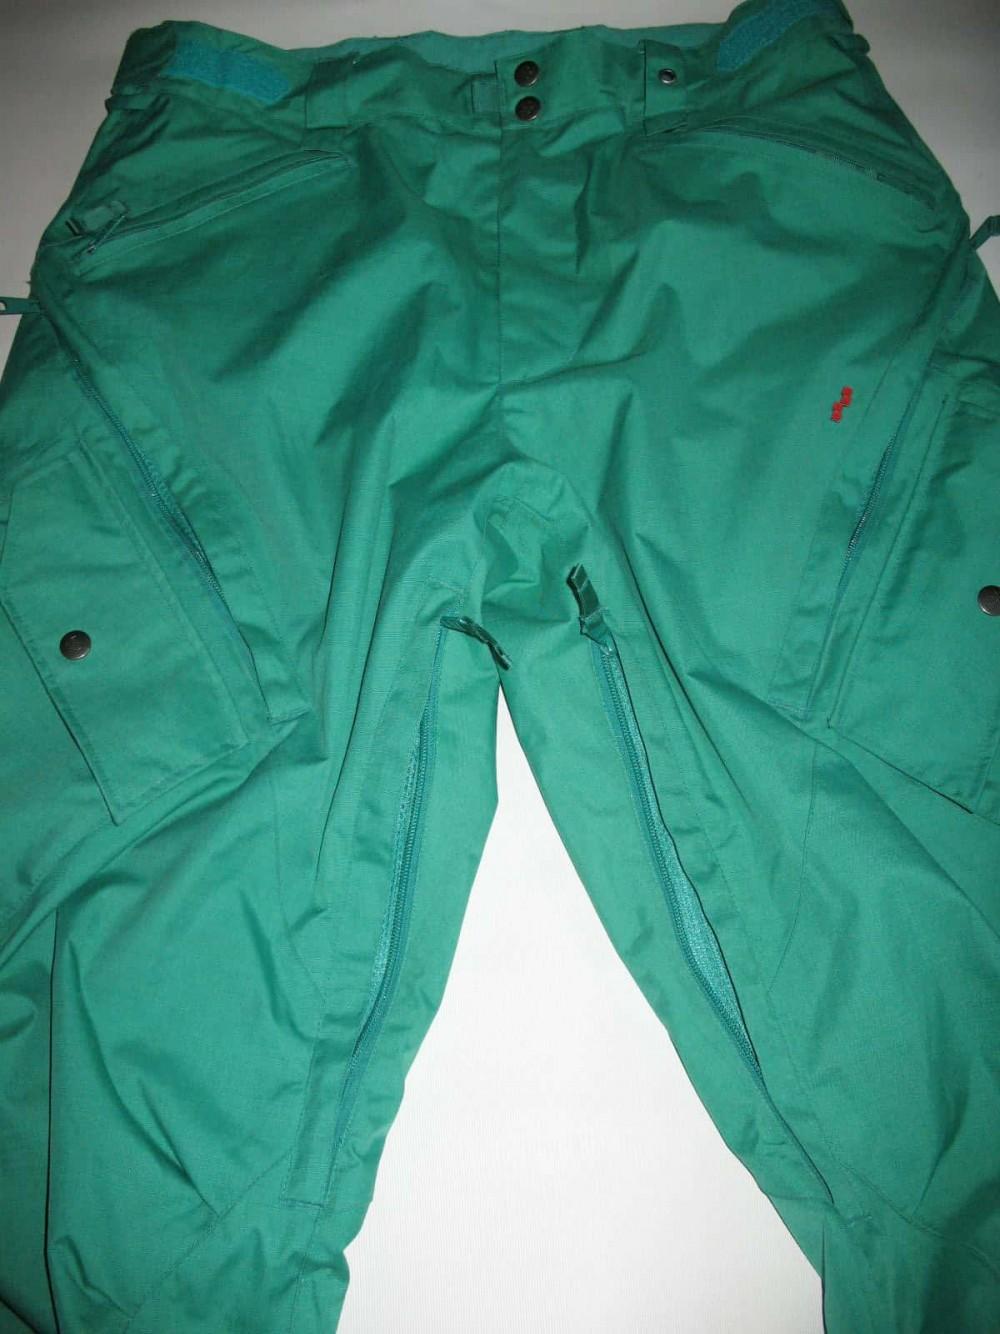 Штаны FOURSQUARE q snowboard pants (размер XL) - 3